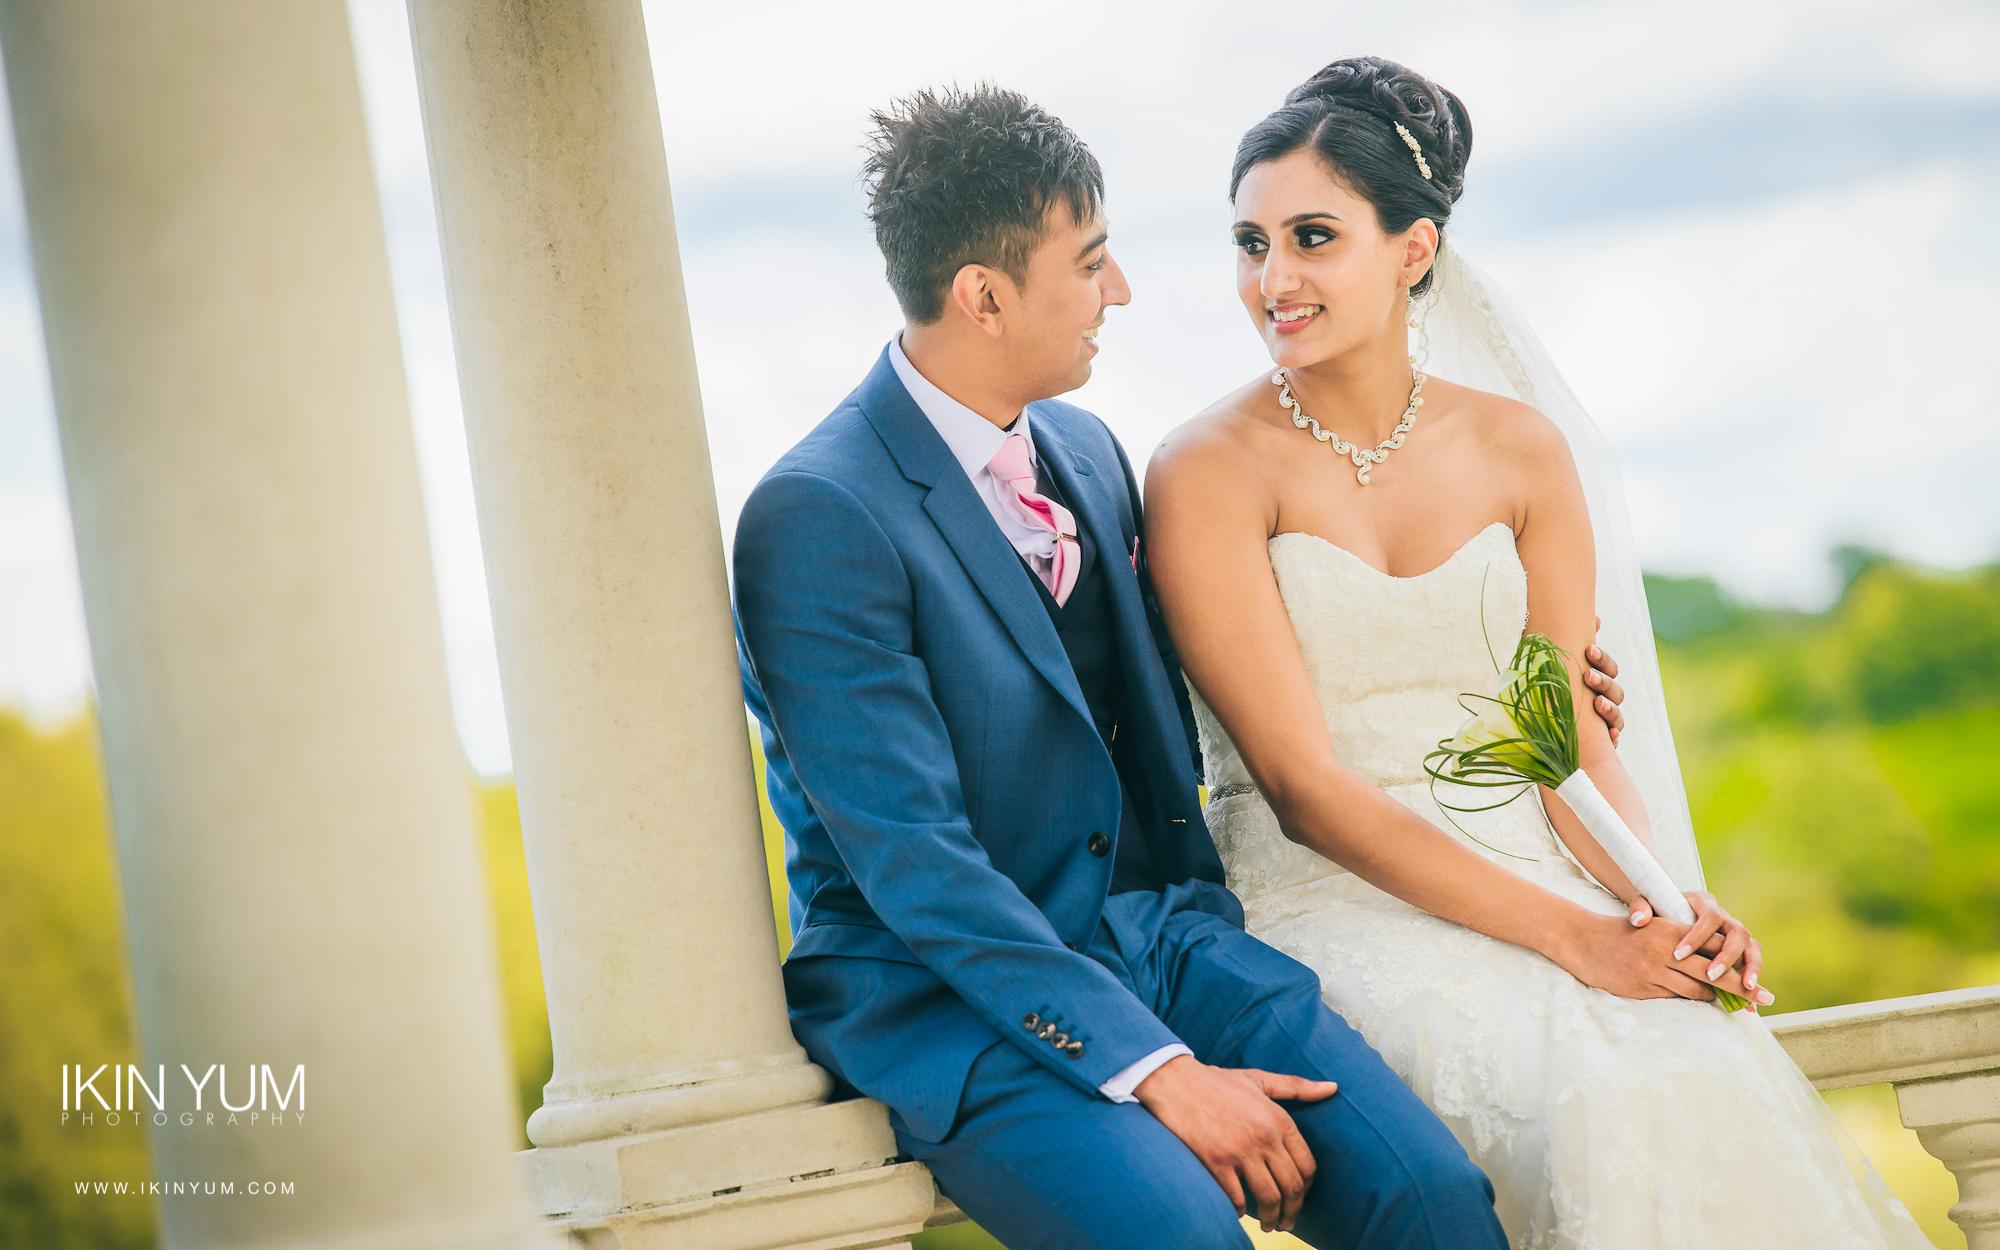 Froyle Park Indian Wedding - Ikin Yum Photography-092.jpg